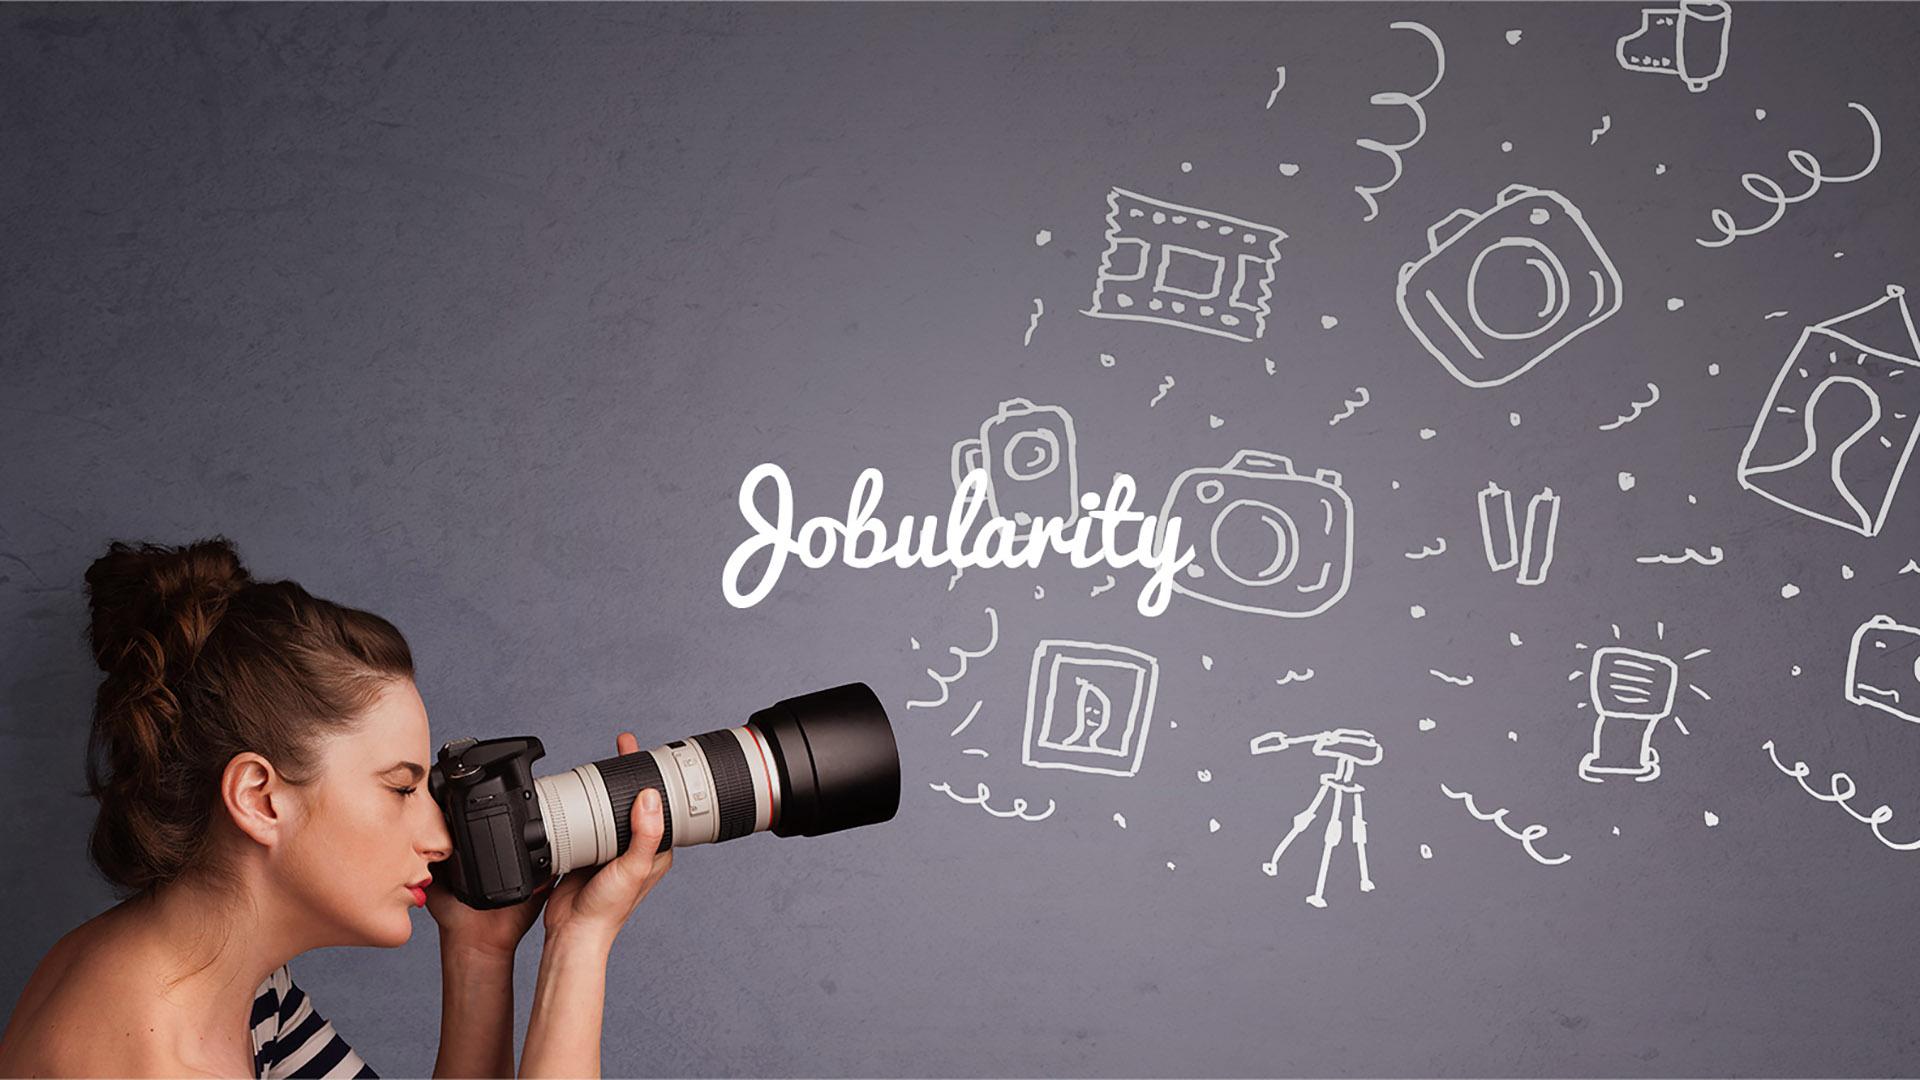 Jobularity Website Design Preview